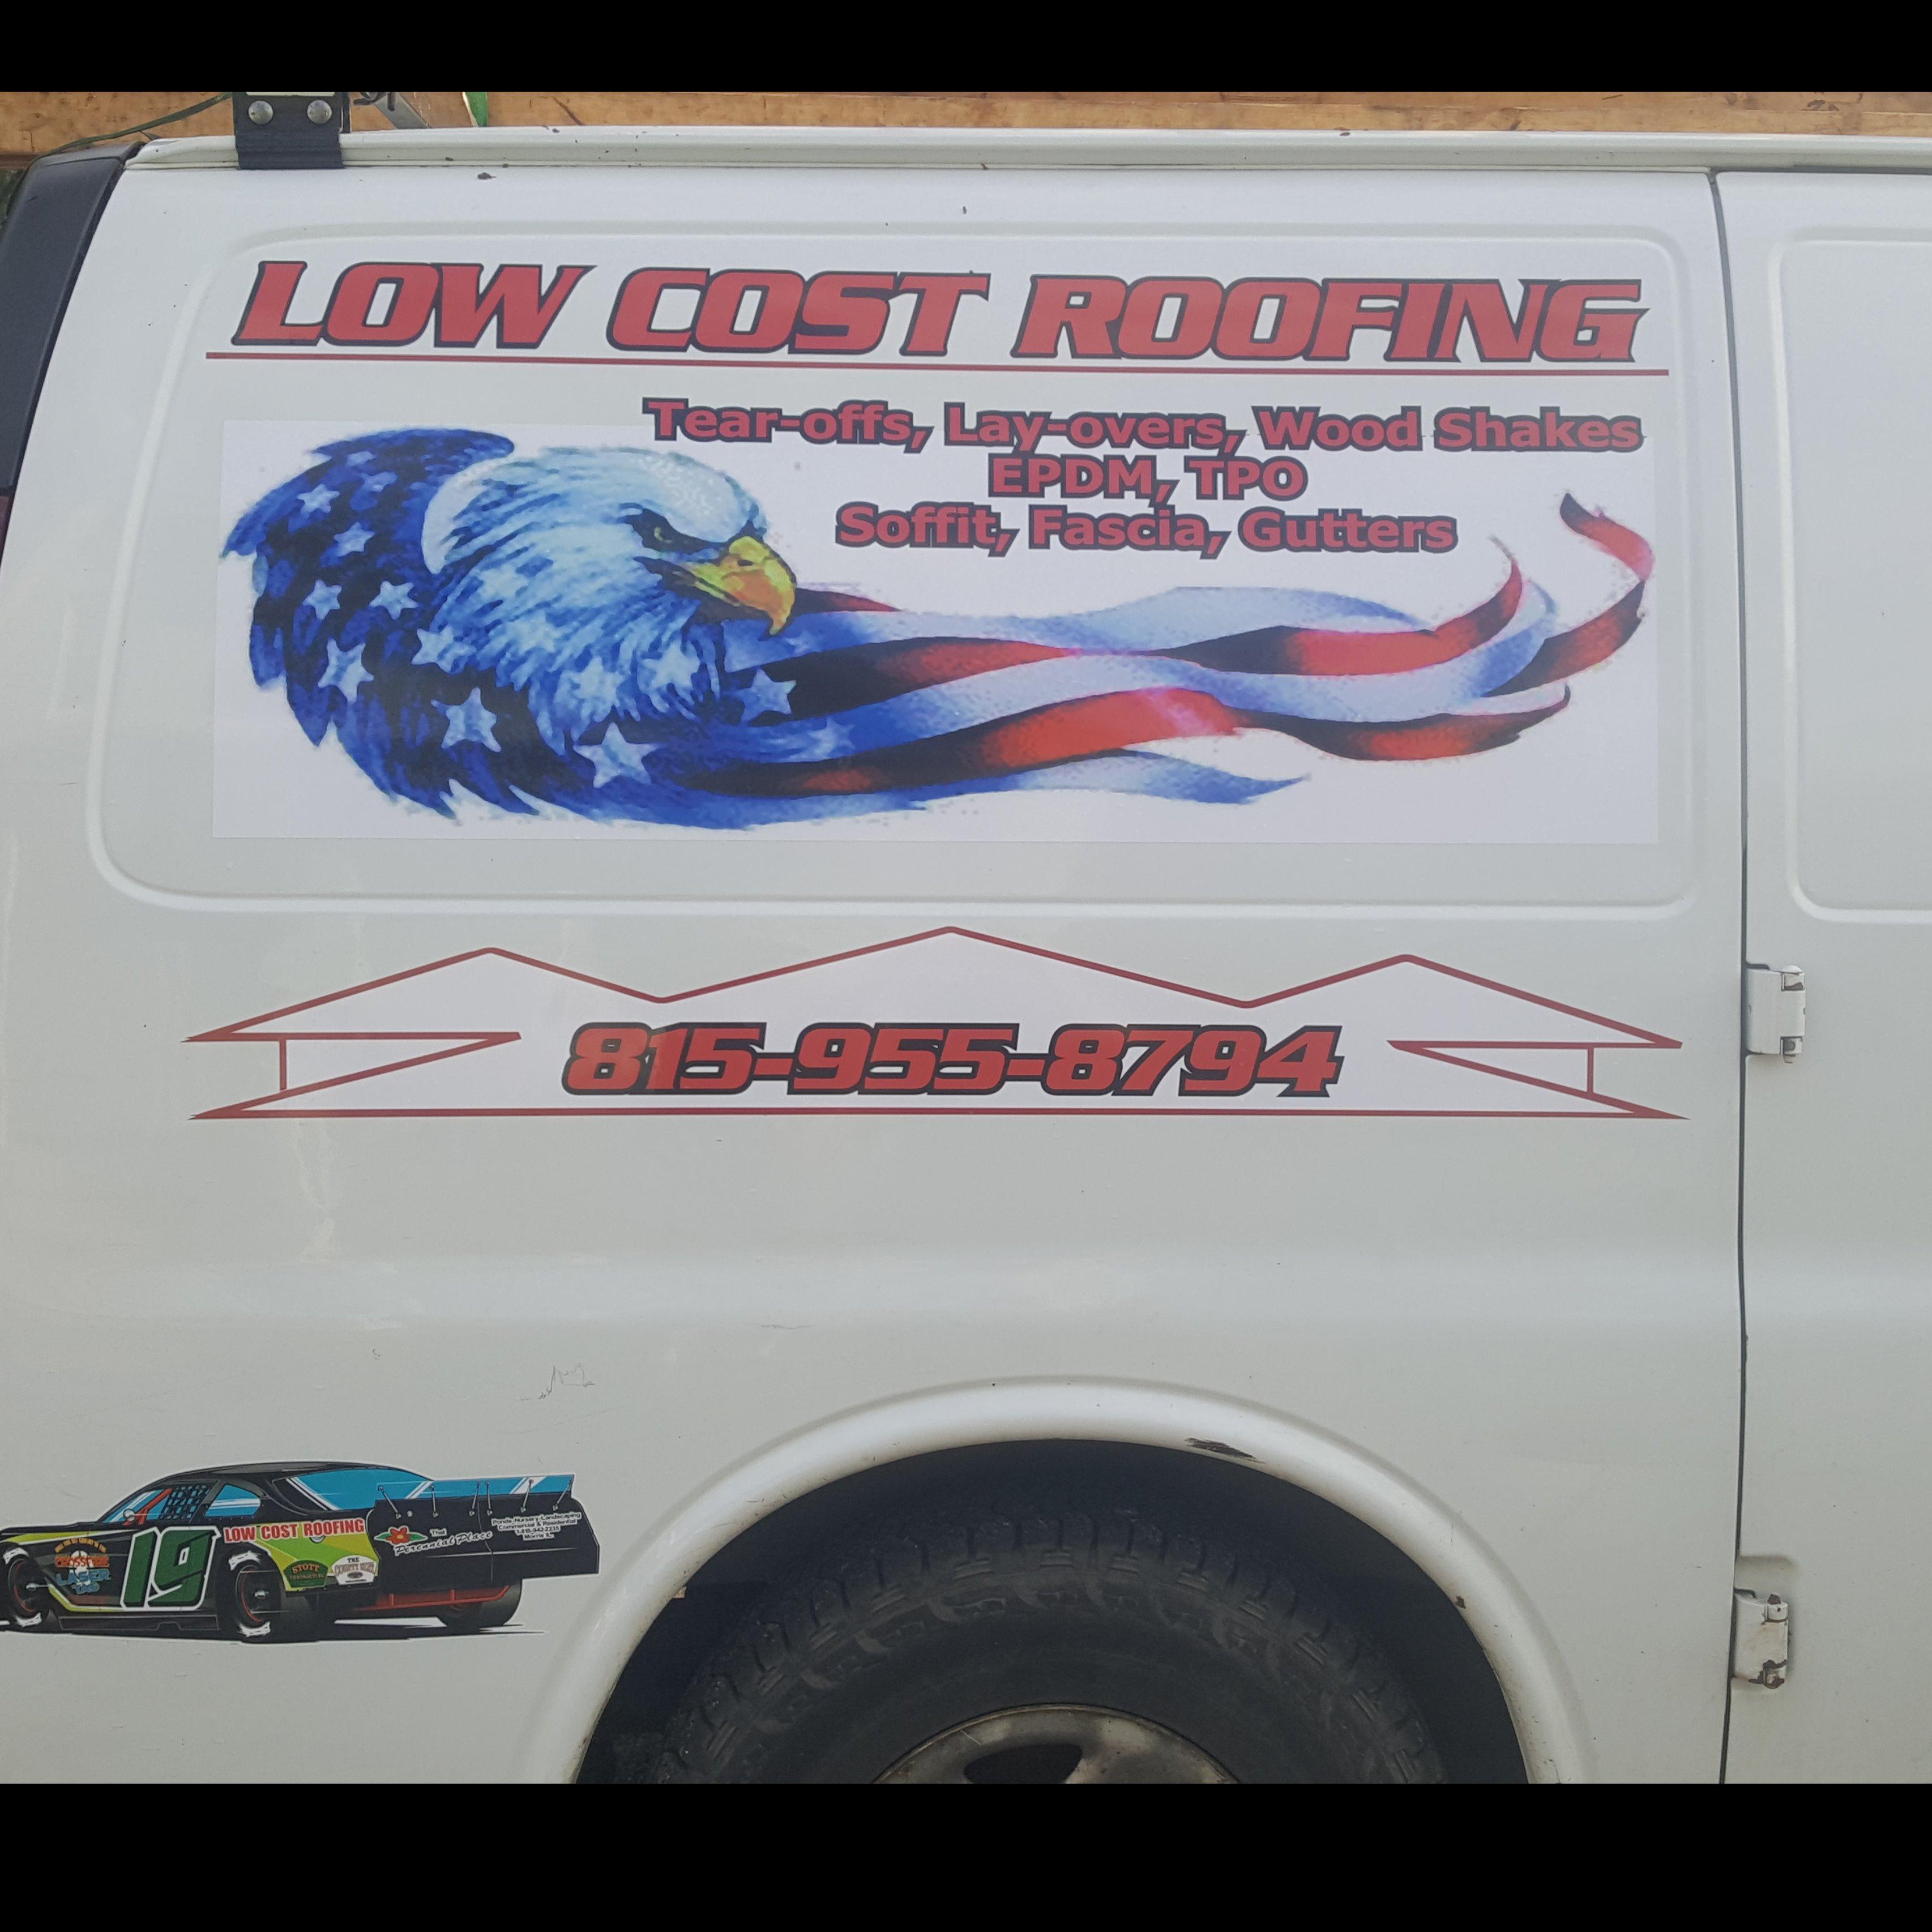 Low Cost Roofing - Joliet, IL - Roofing Contractors